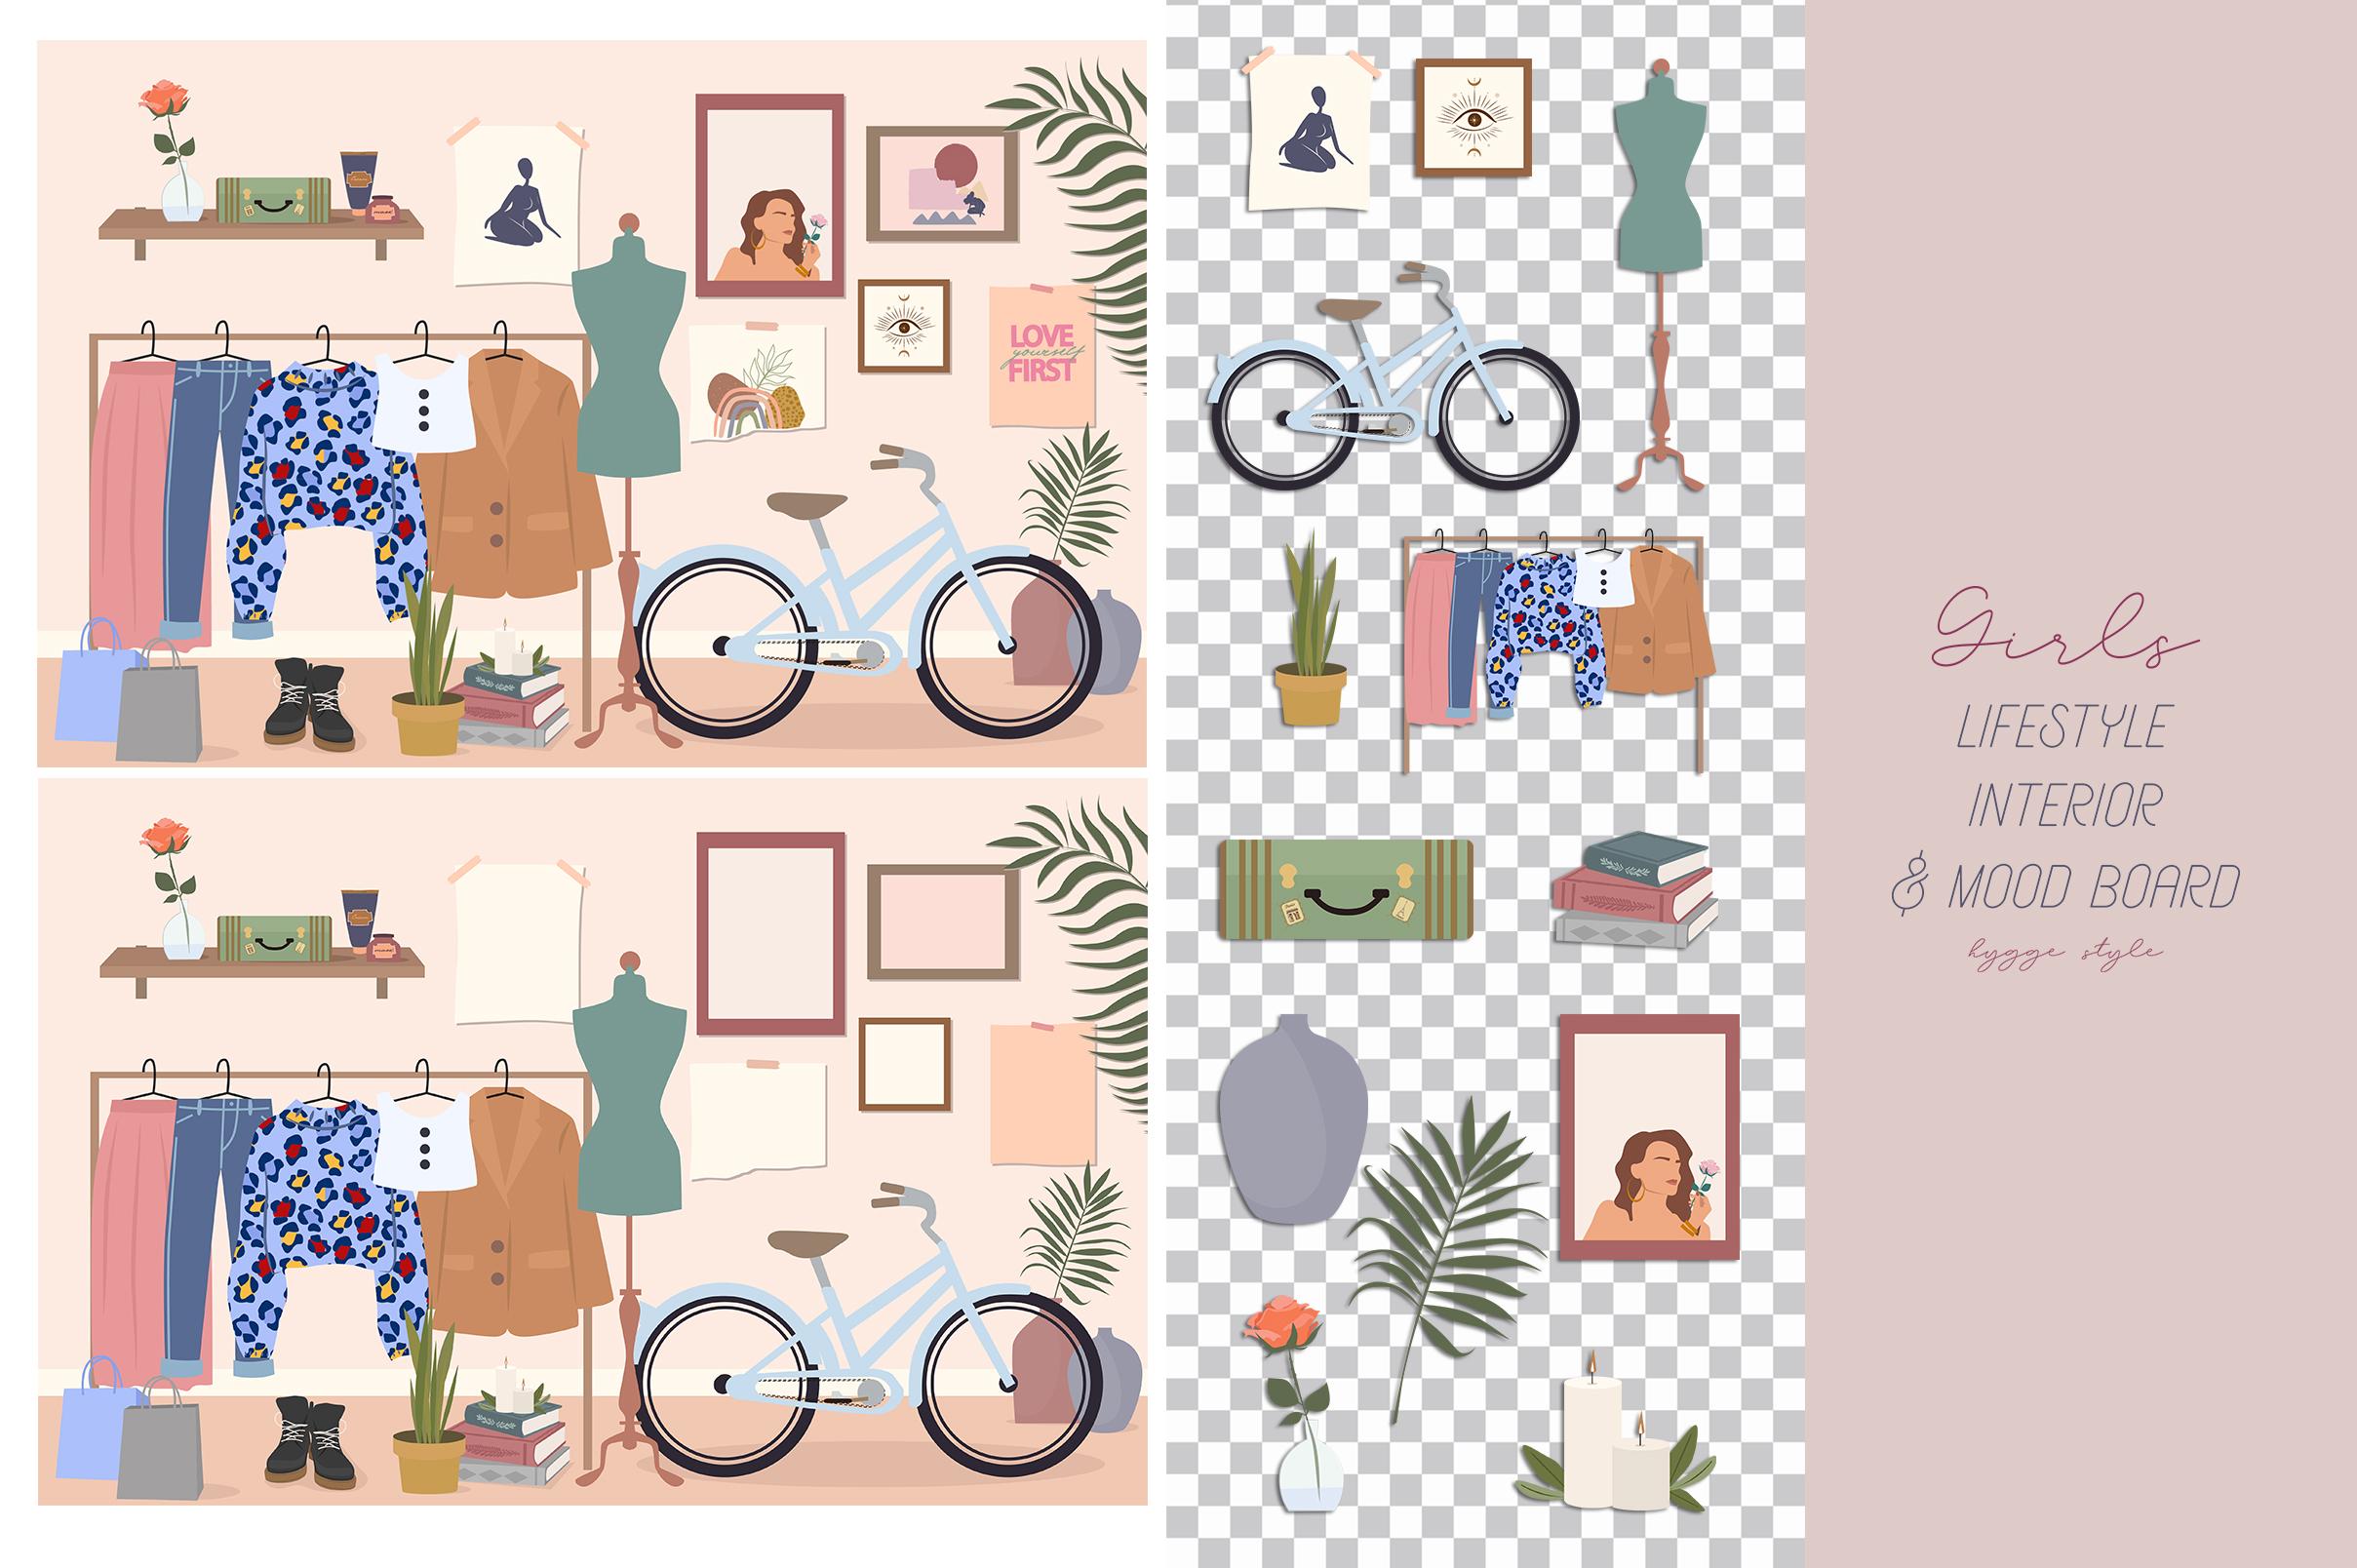 Lifestyle interior & mood board example image 5